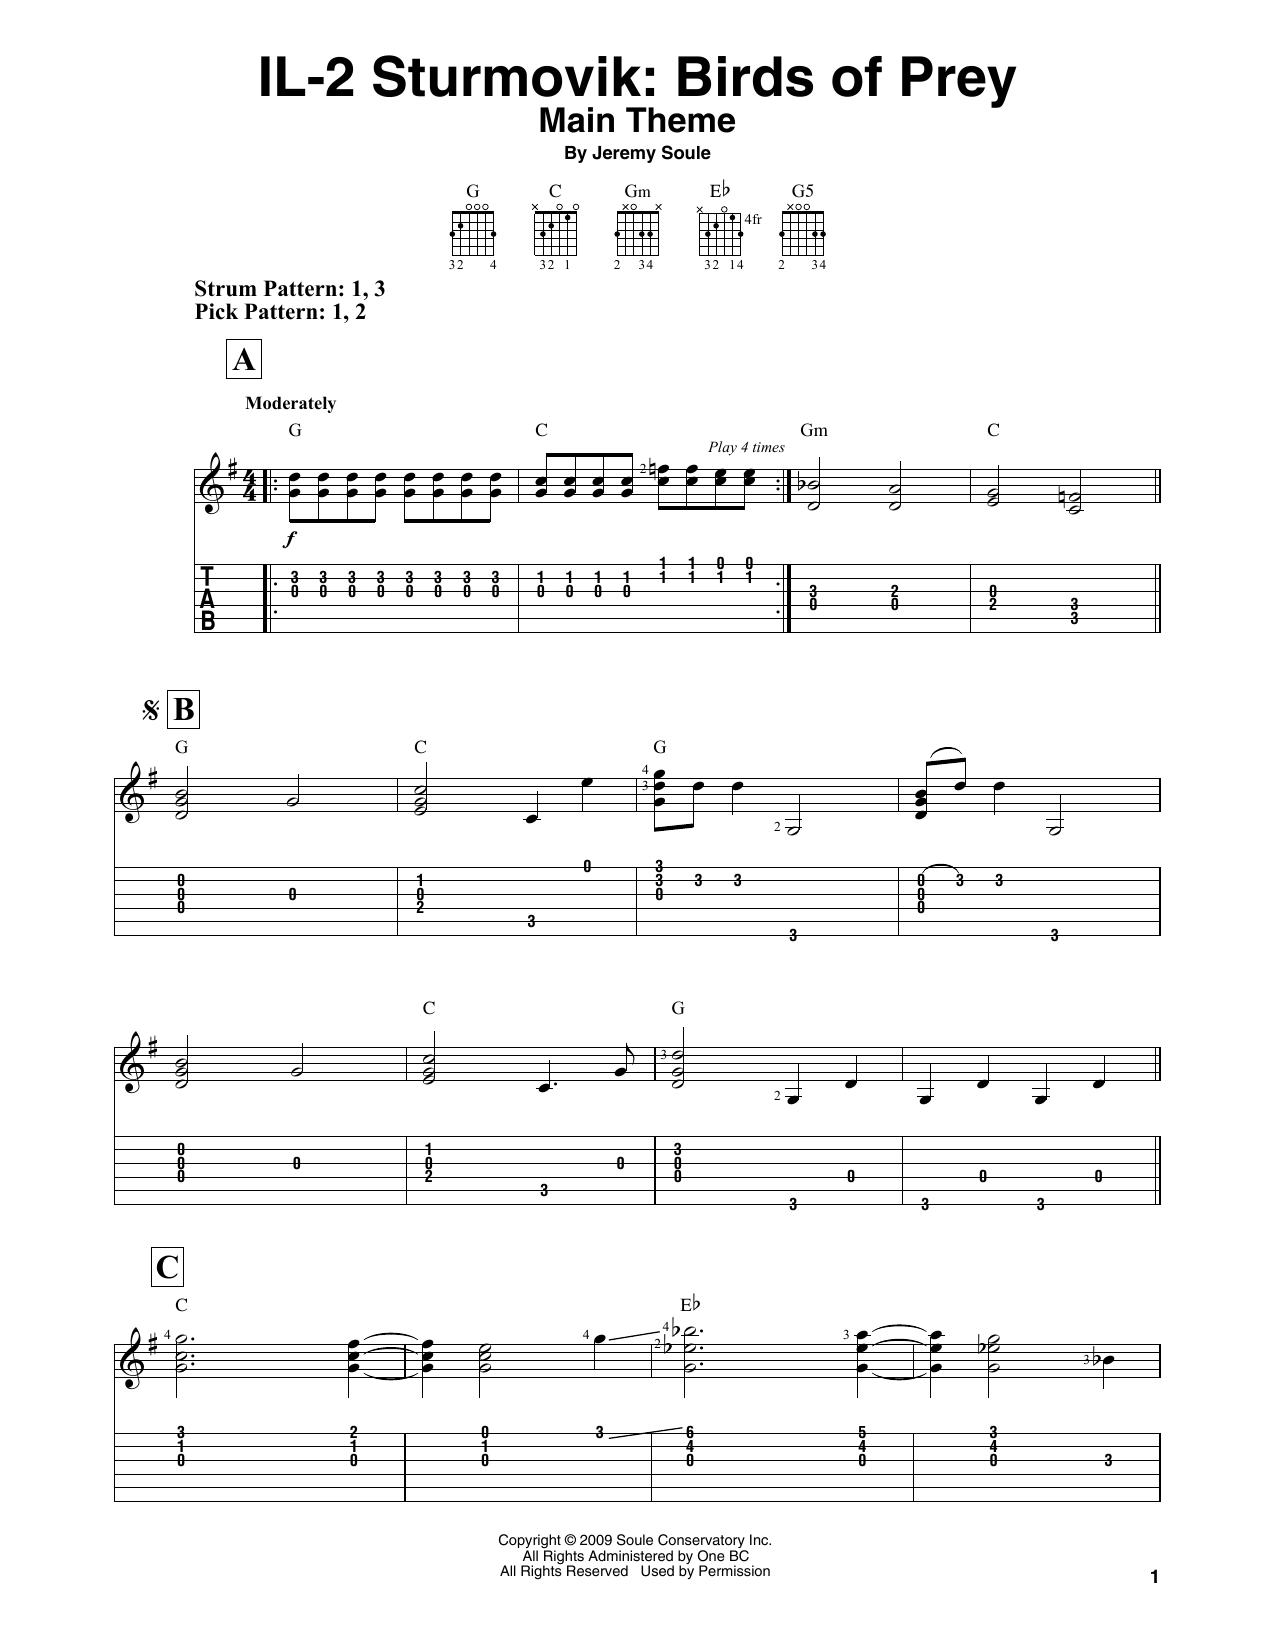 IL-2 Sturmovik: Birds of Prey - Main Theme (Easy Guitar Tab)